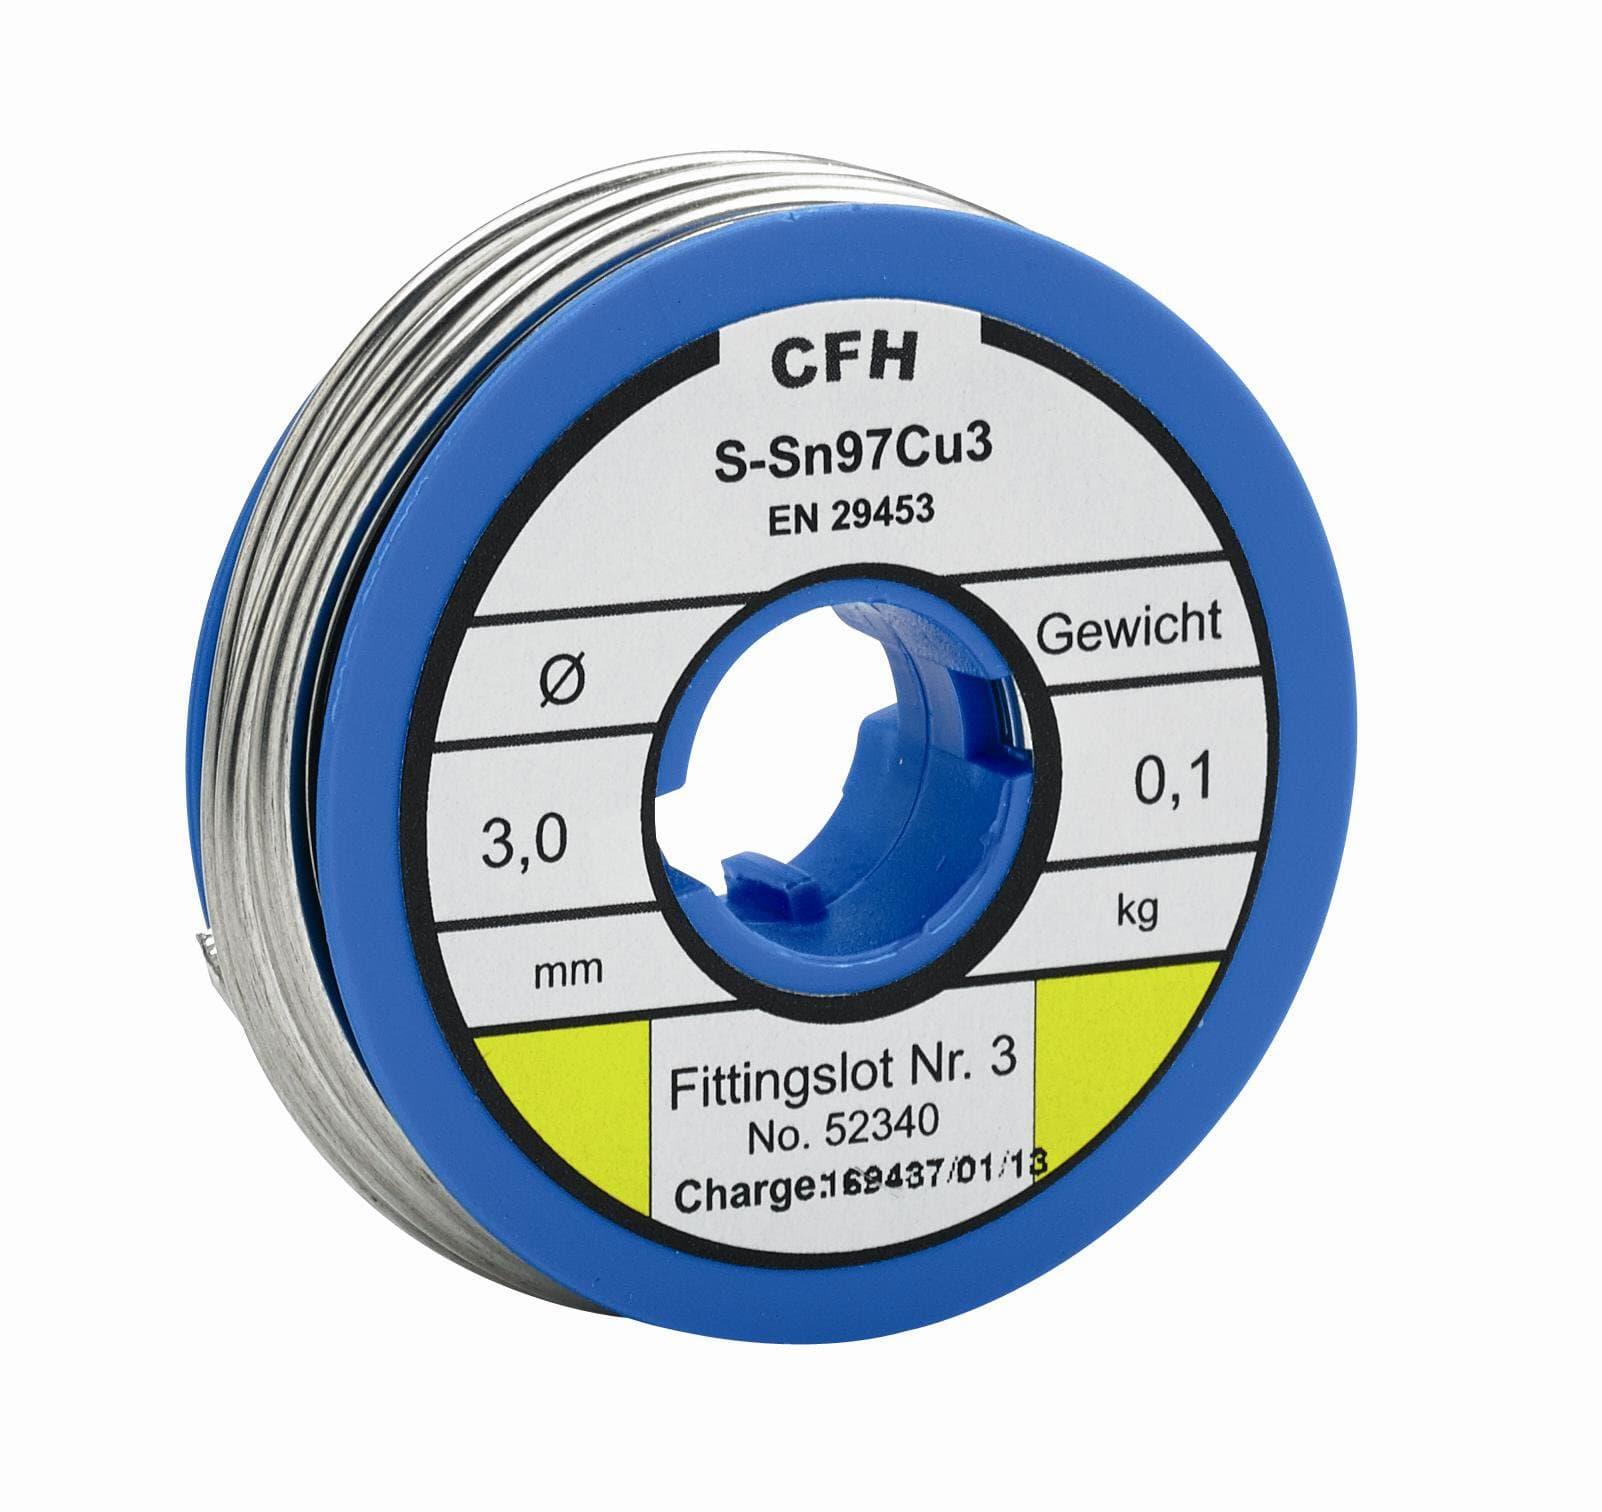 Cfh Fittingslot WL 340 100 g Lote